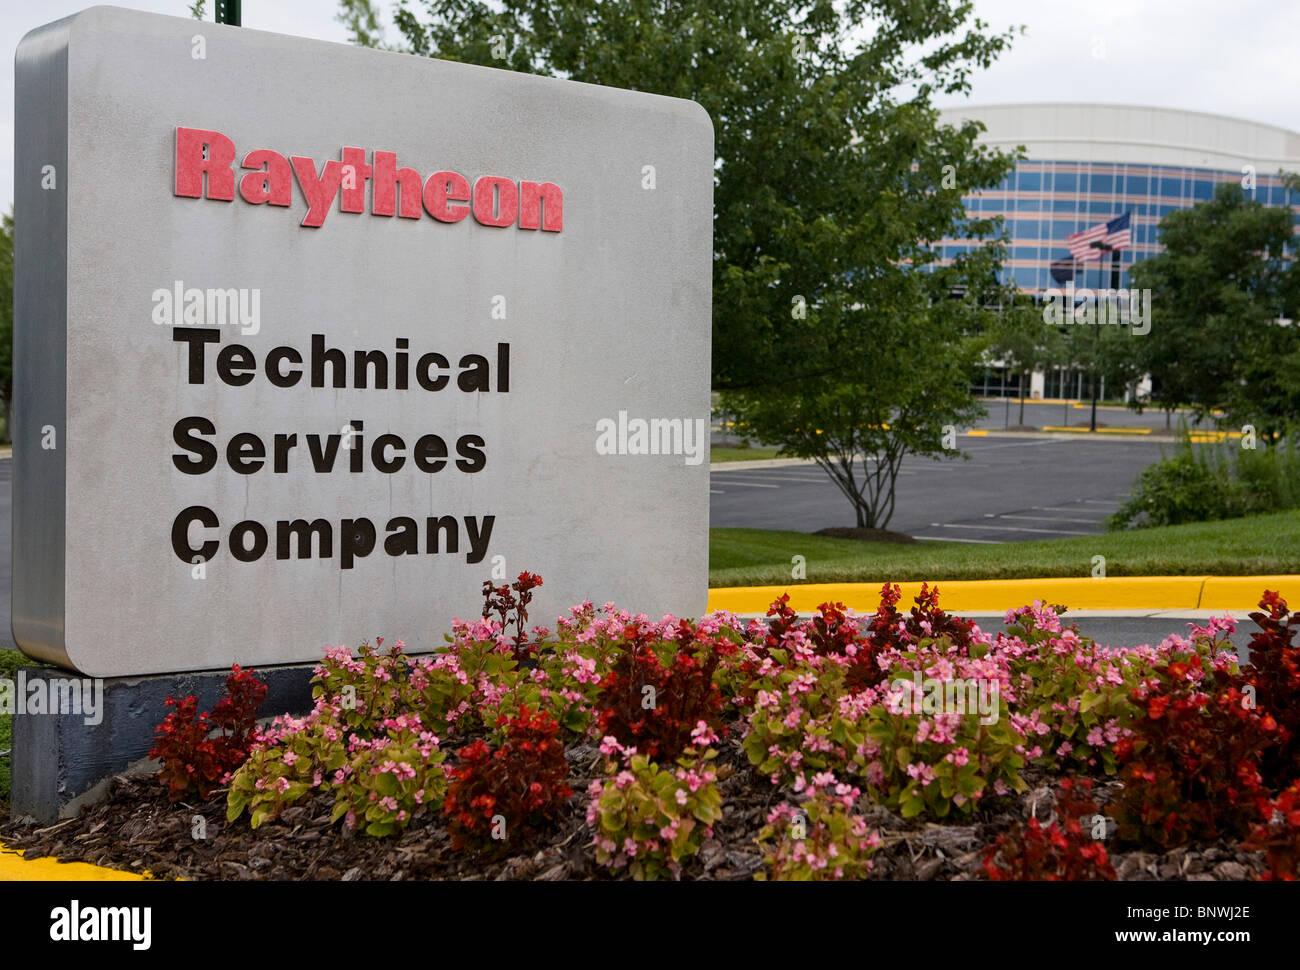 Raytheon Technical Services Company. - Stock Image